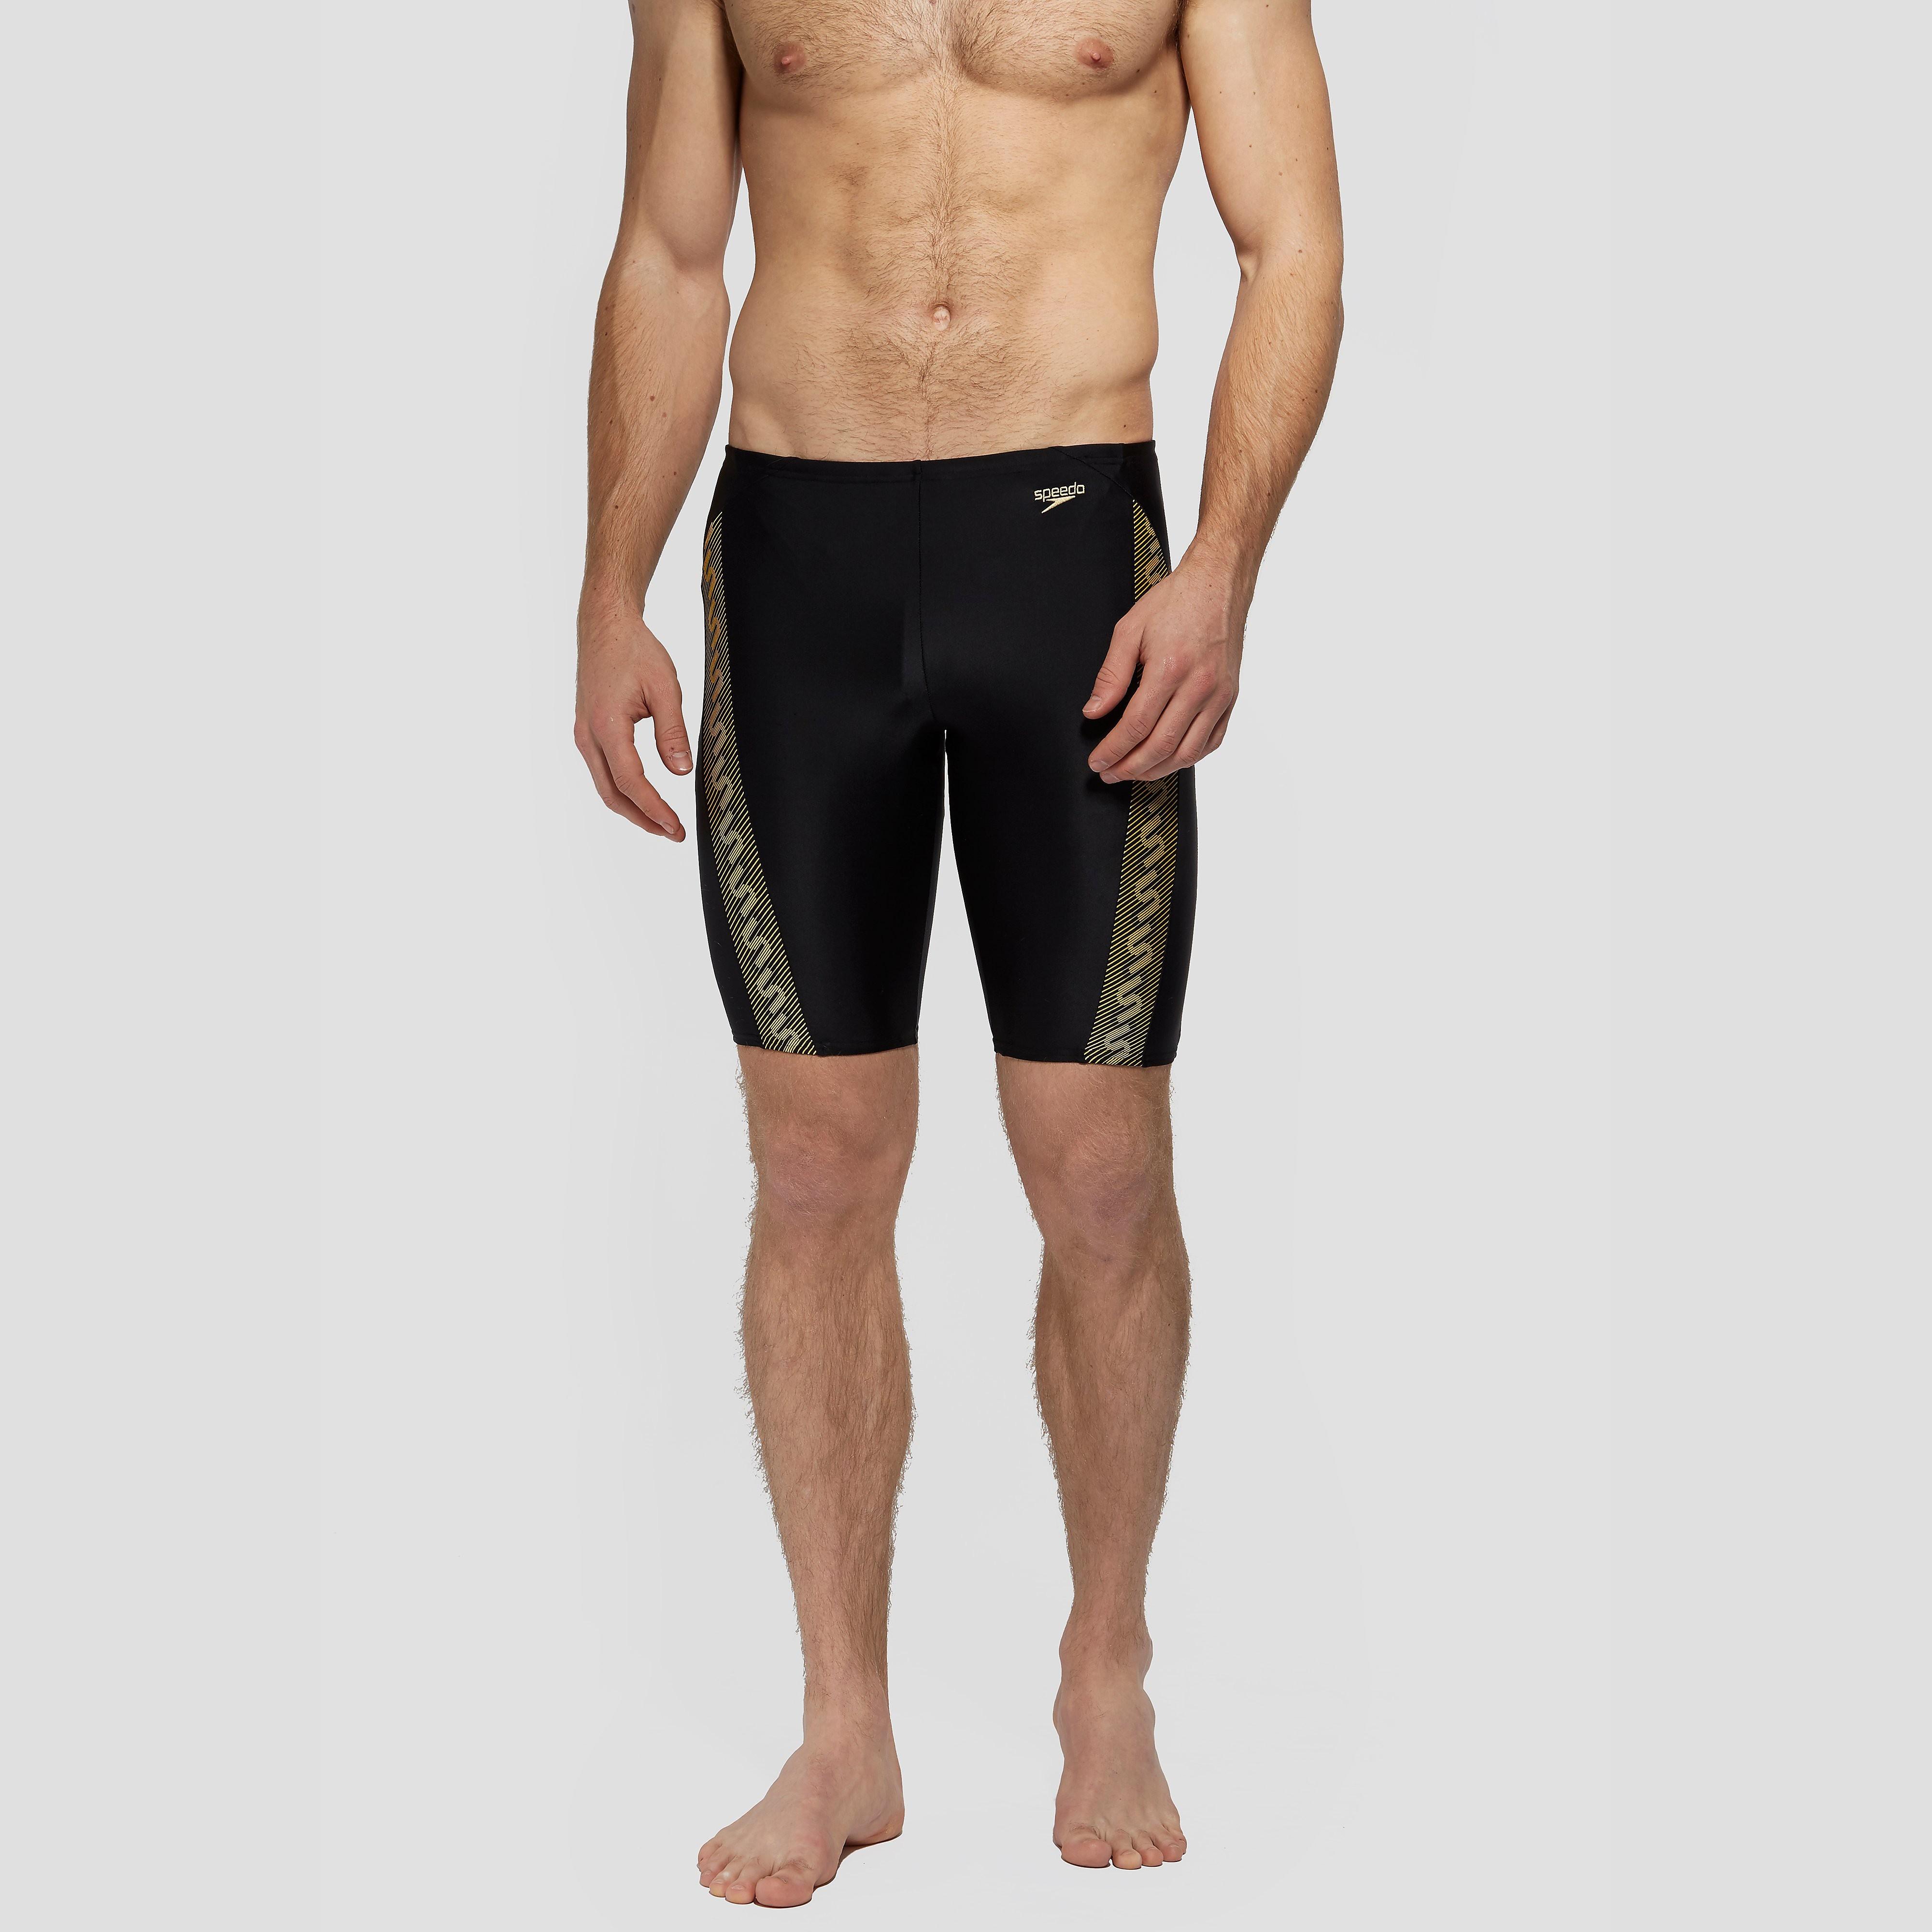 Speedo Monogram Men's Swimming Jammer